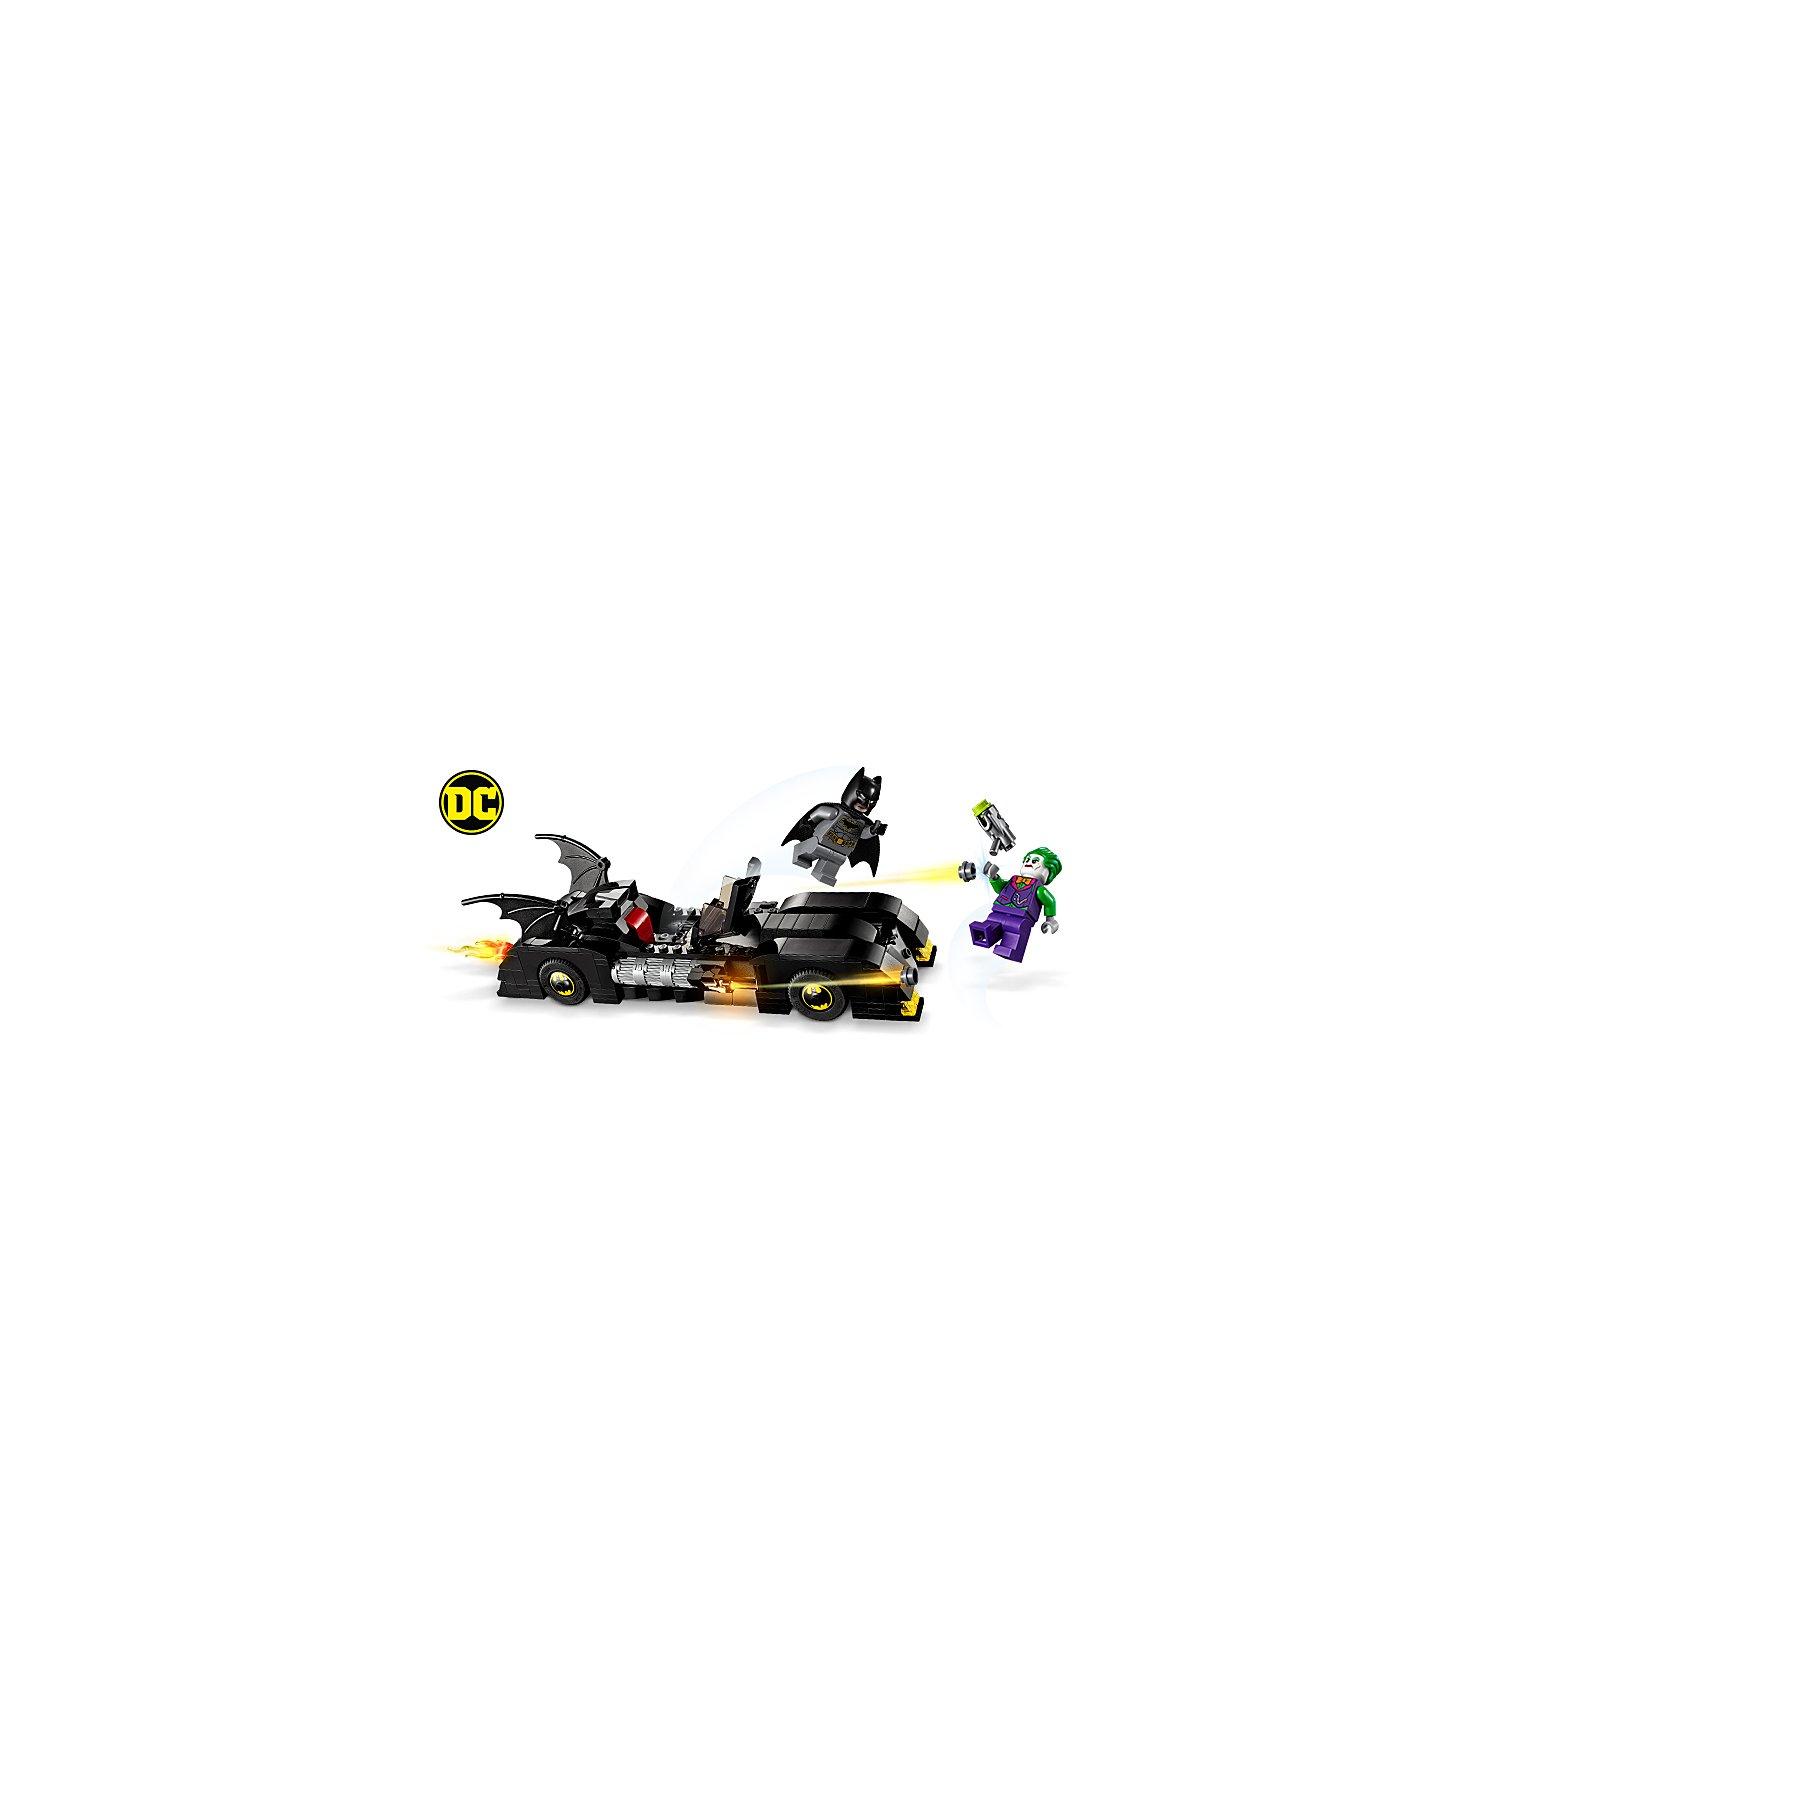 LEGO DC Comics - 76119 - Batmobile: Pursuit of The Joker